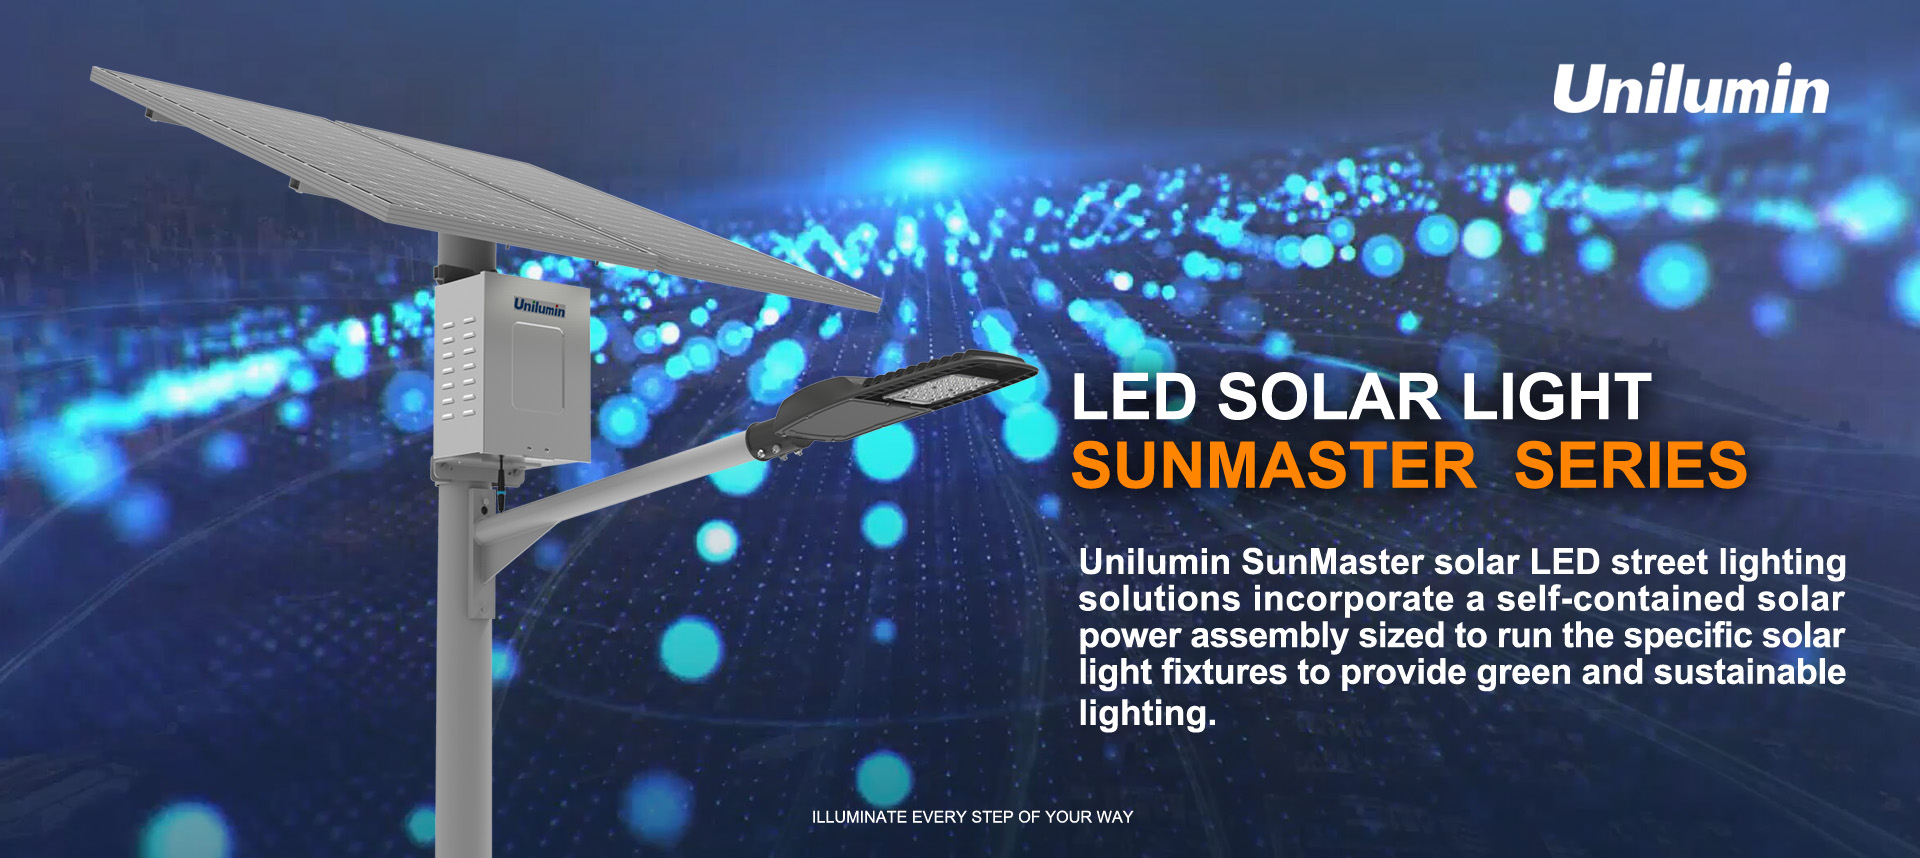 www unilumin lighting com